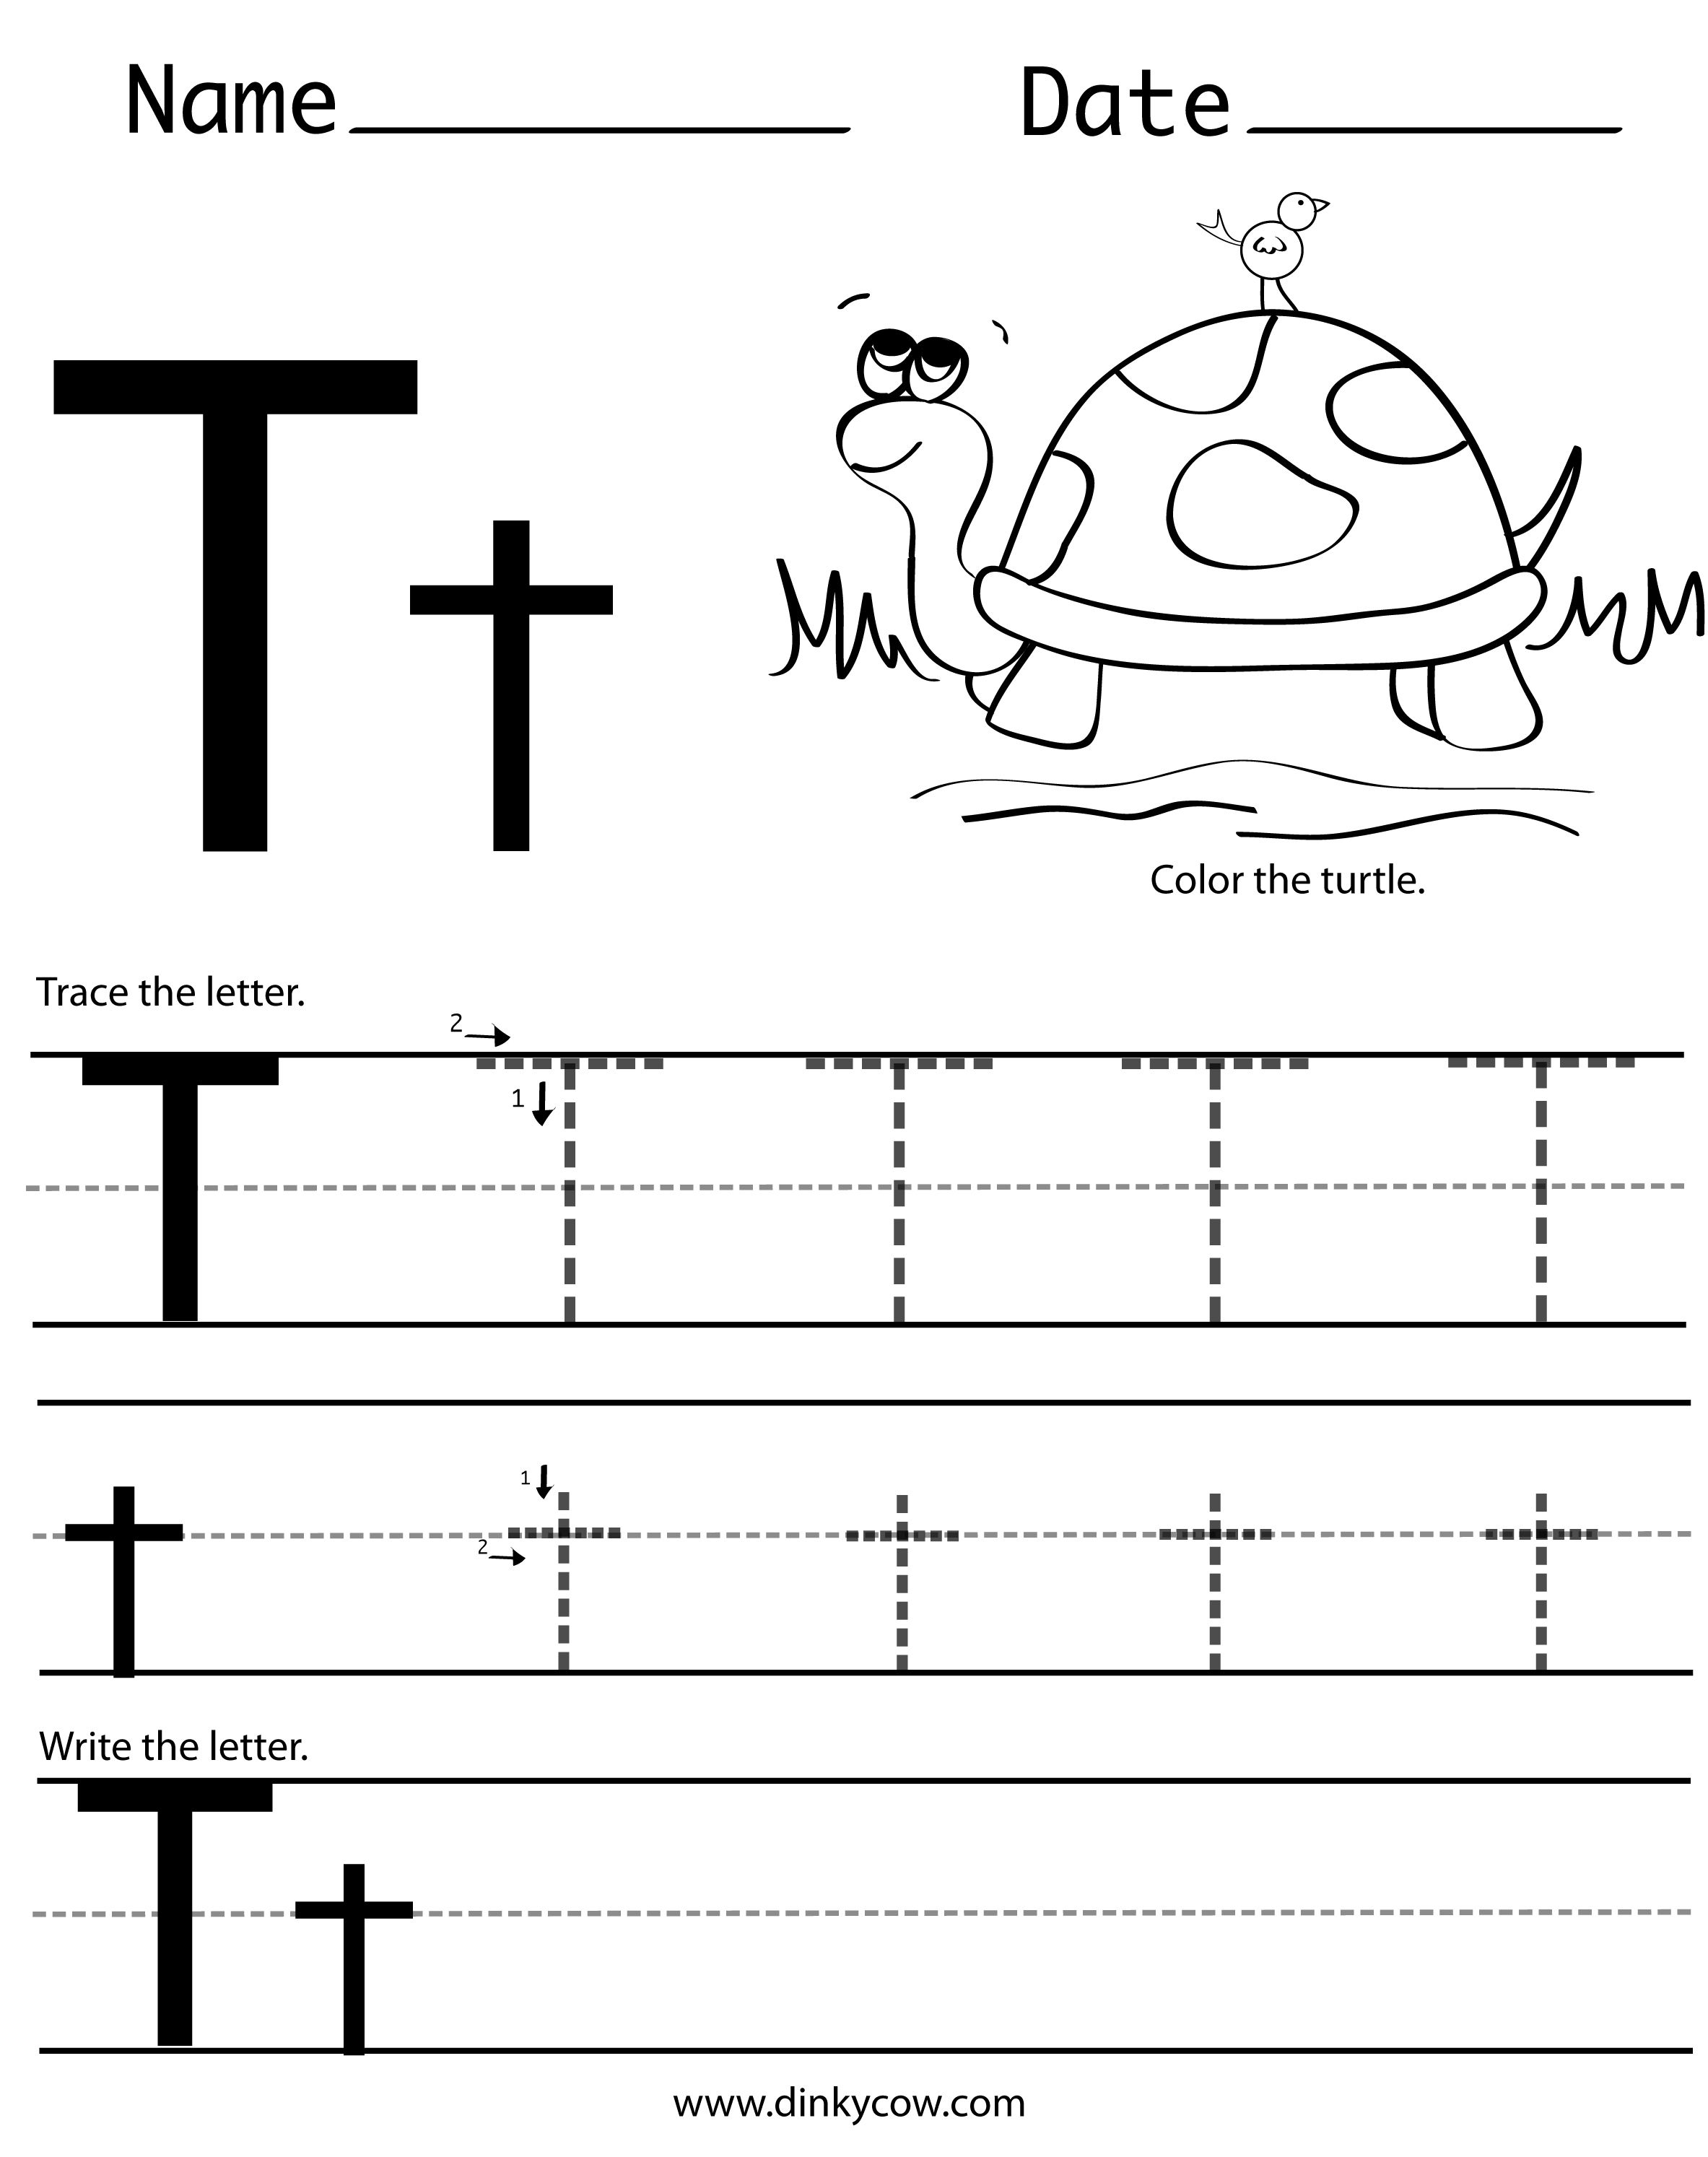 T Free Handwriting Worksheet Print 2 366 2 988 Pixels